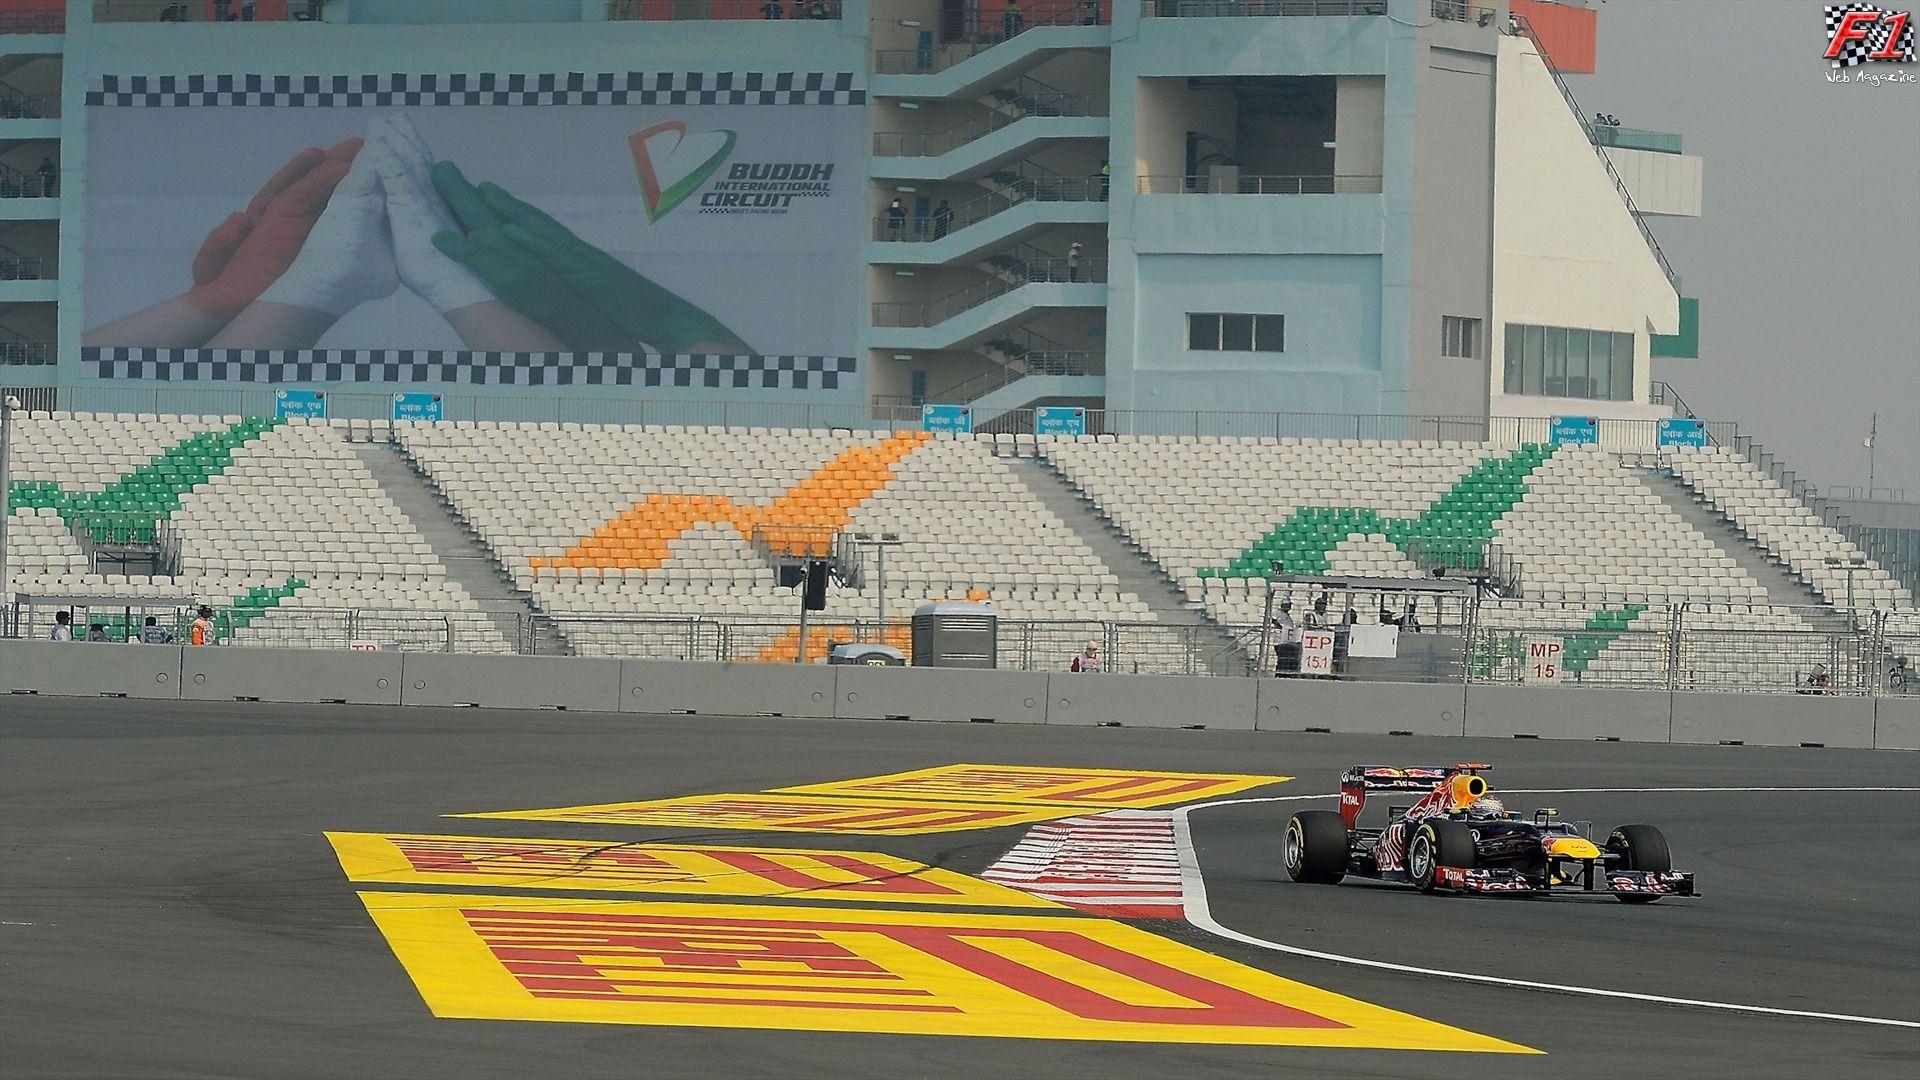 Gp India - Qualifiche - Vettel